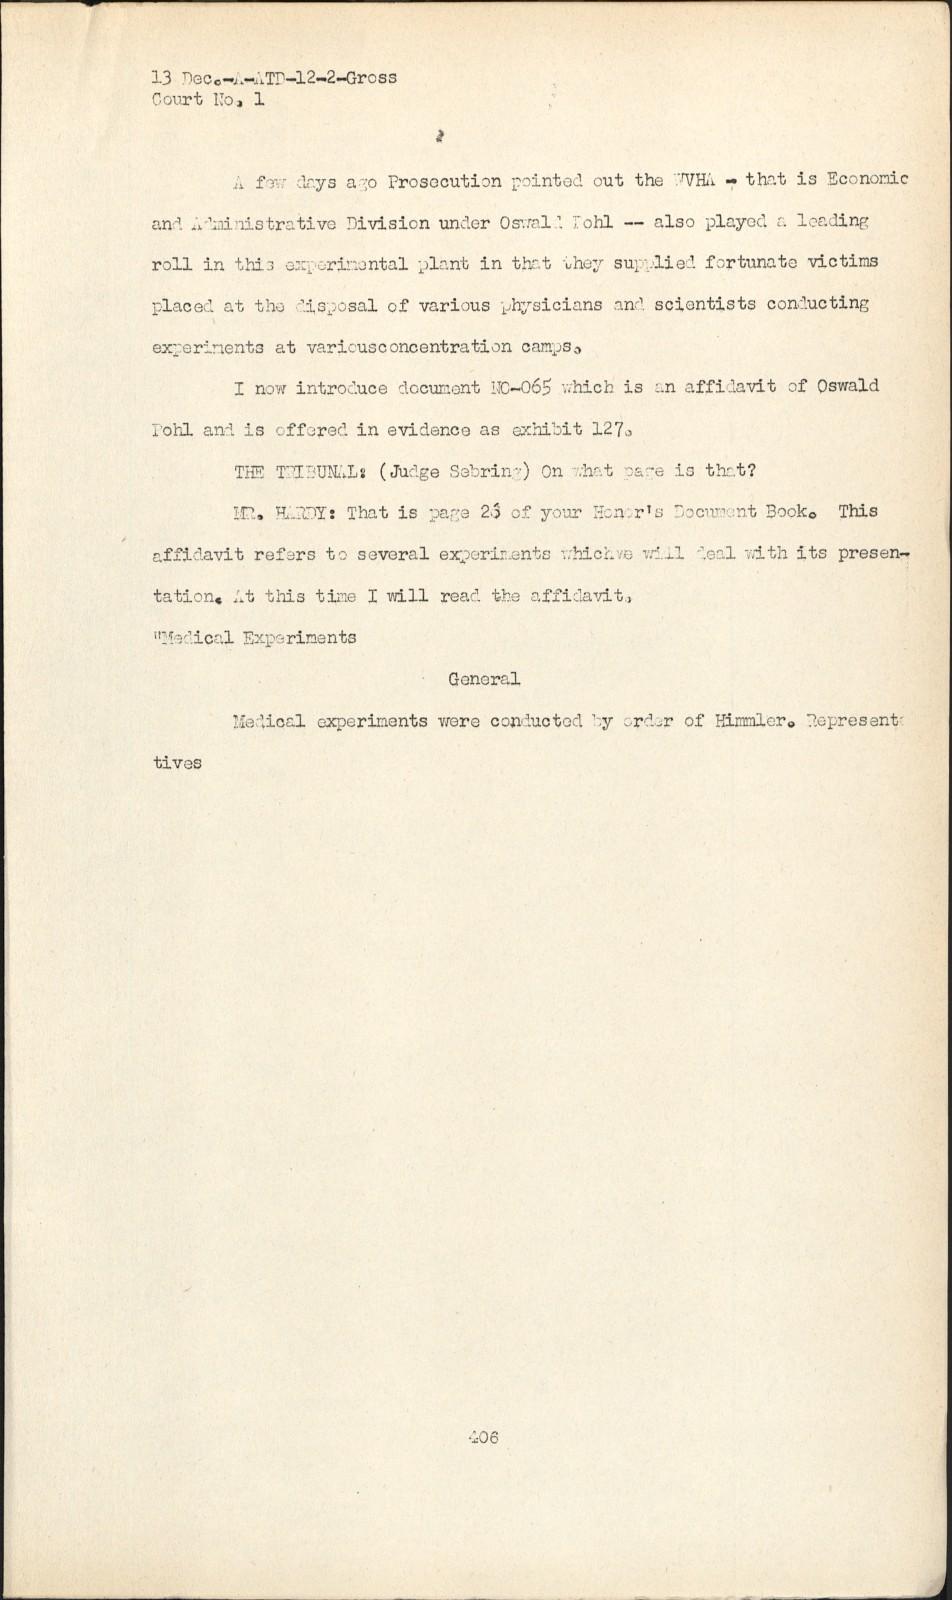 Nuremberg - Transcript Viewer - Transcript for NMT 1